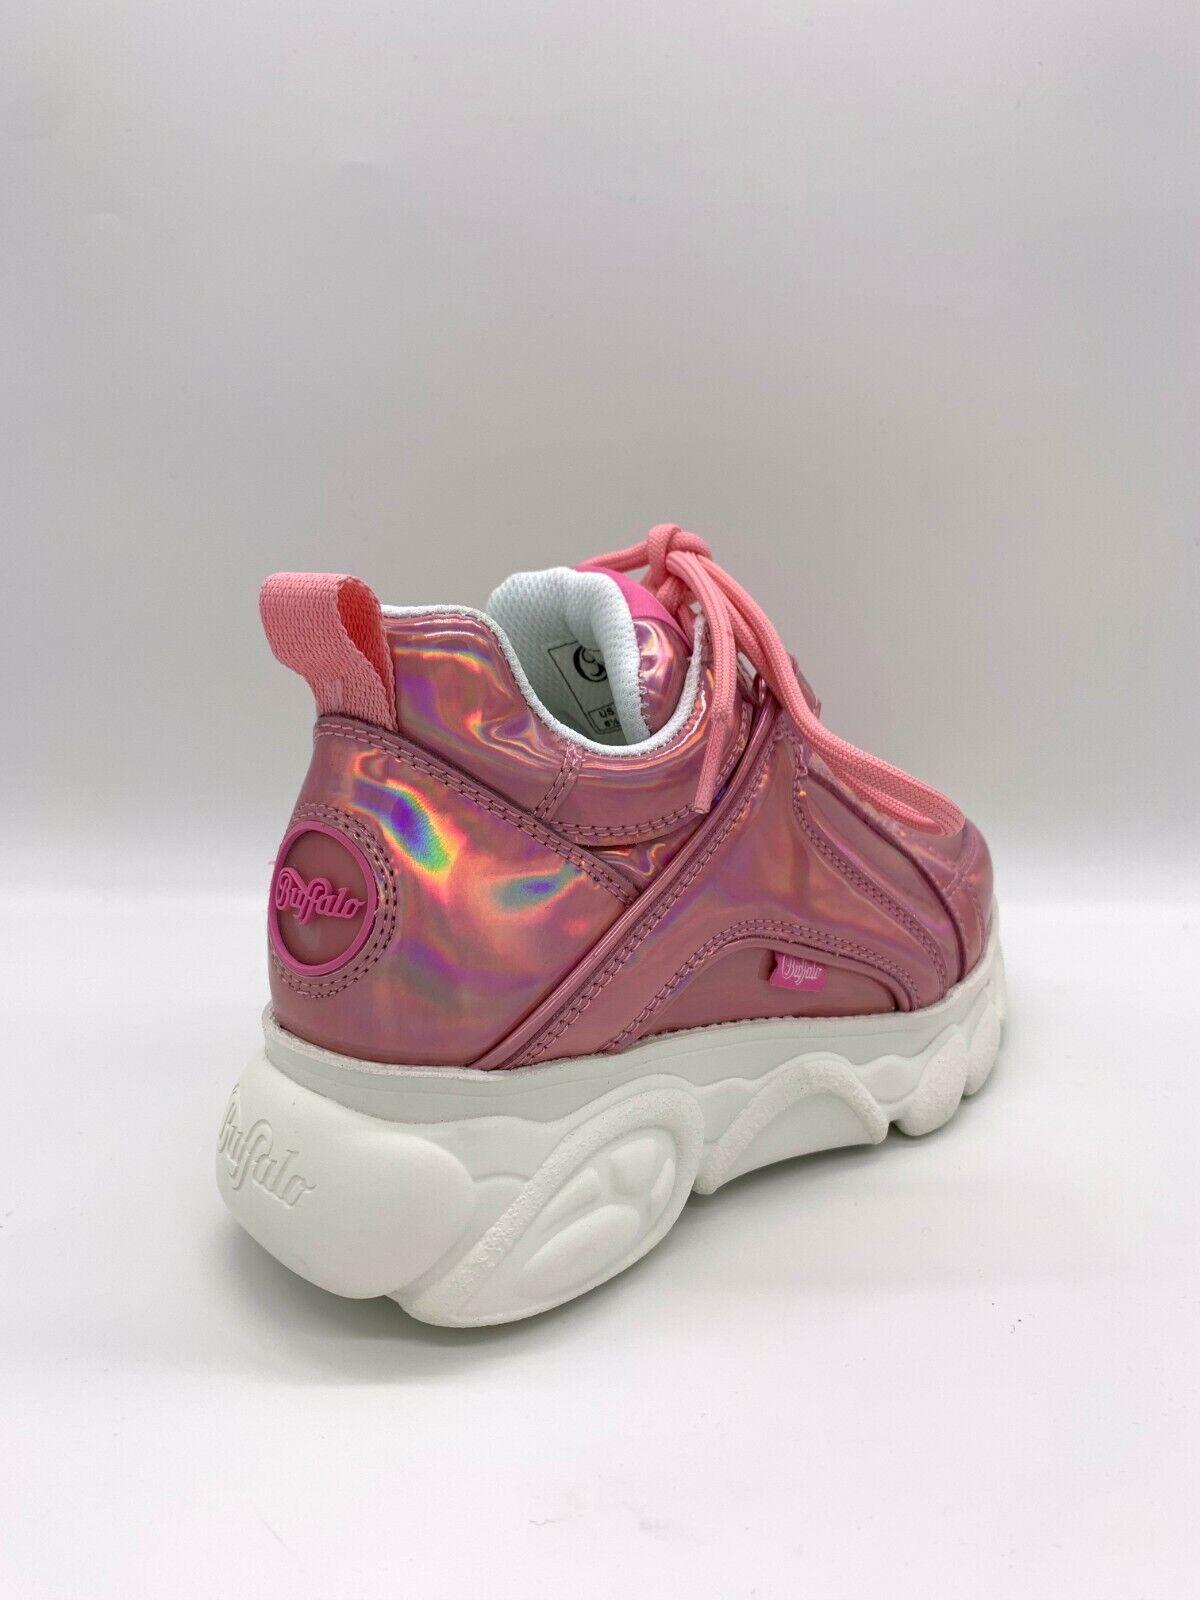 Details about Buffalo Boots Shoes Sneaker Platform Shoes 90er Pink Glitter Limited show original title